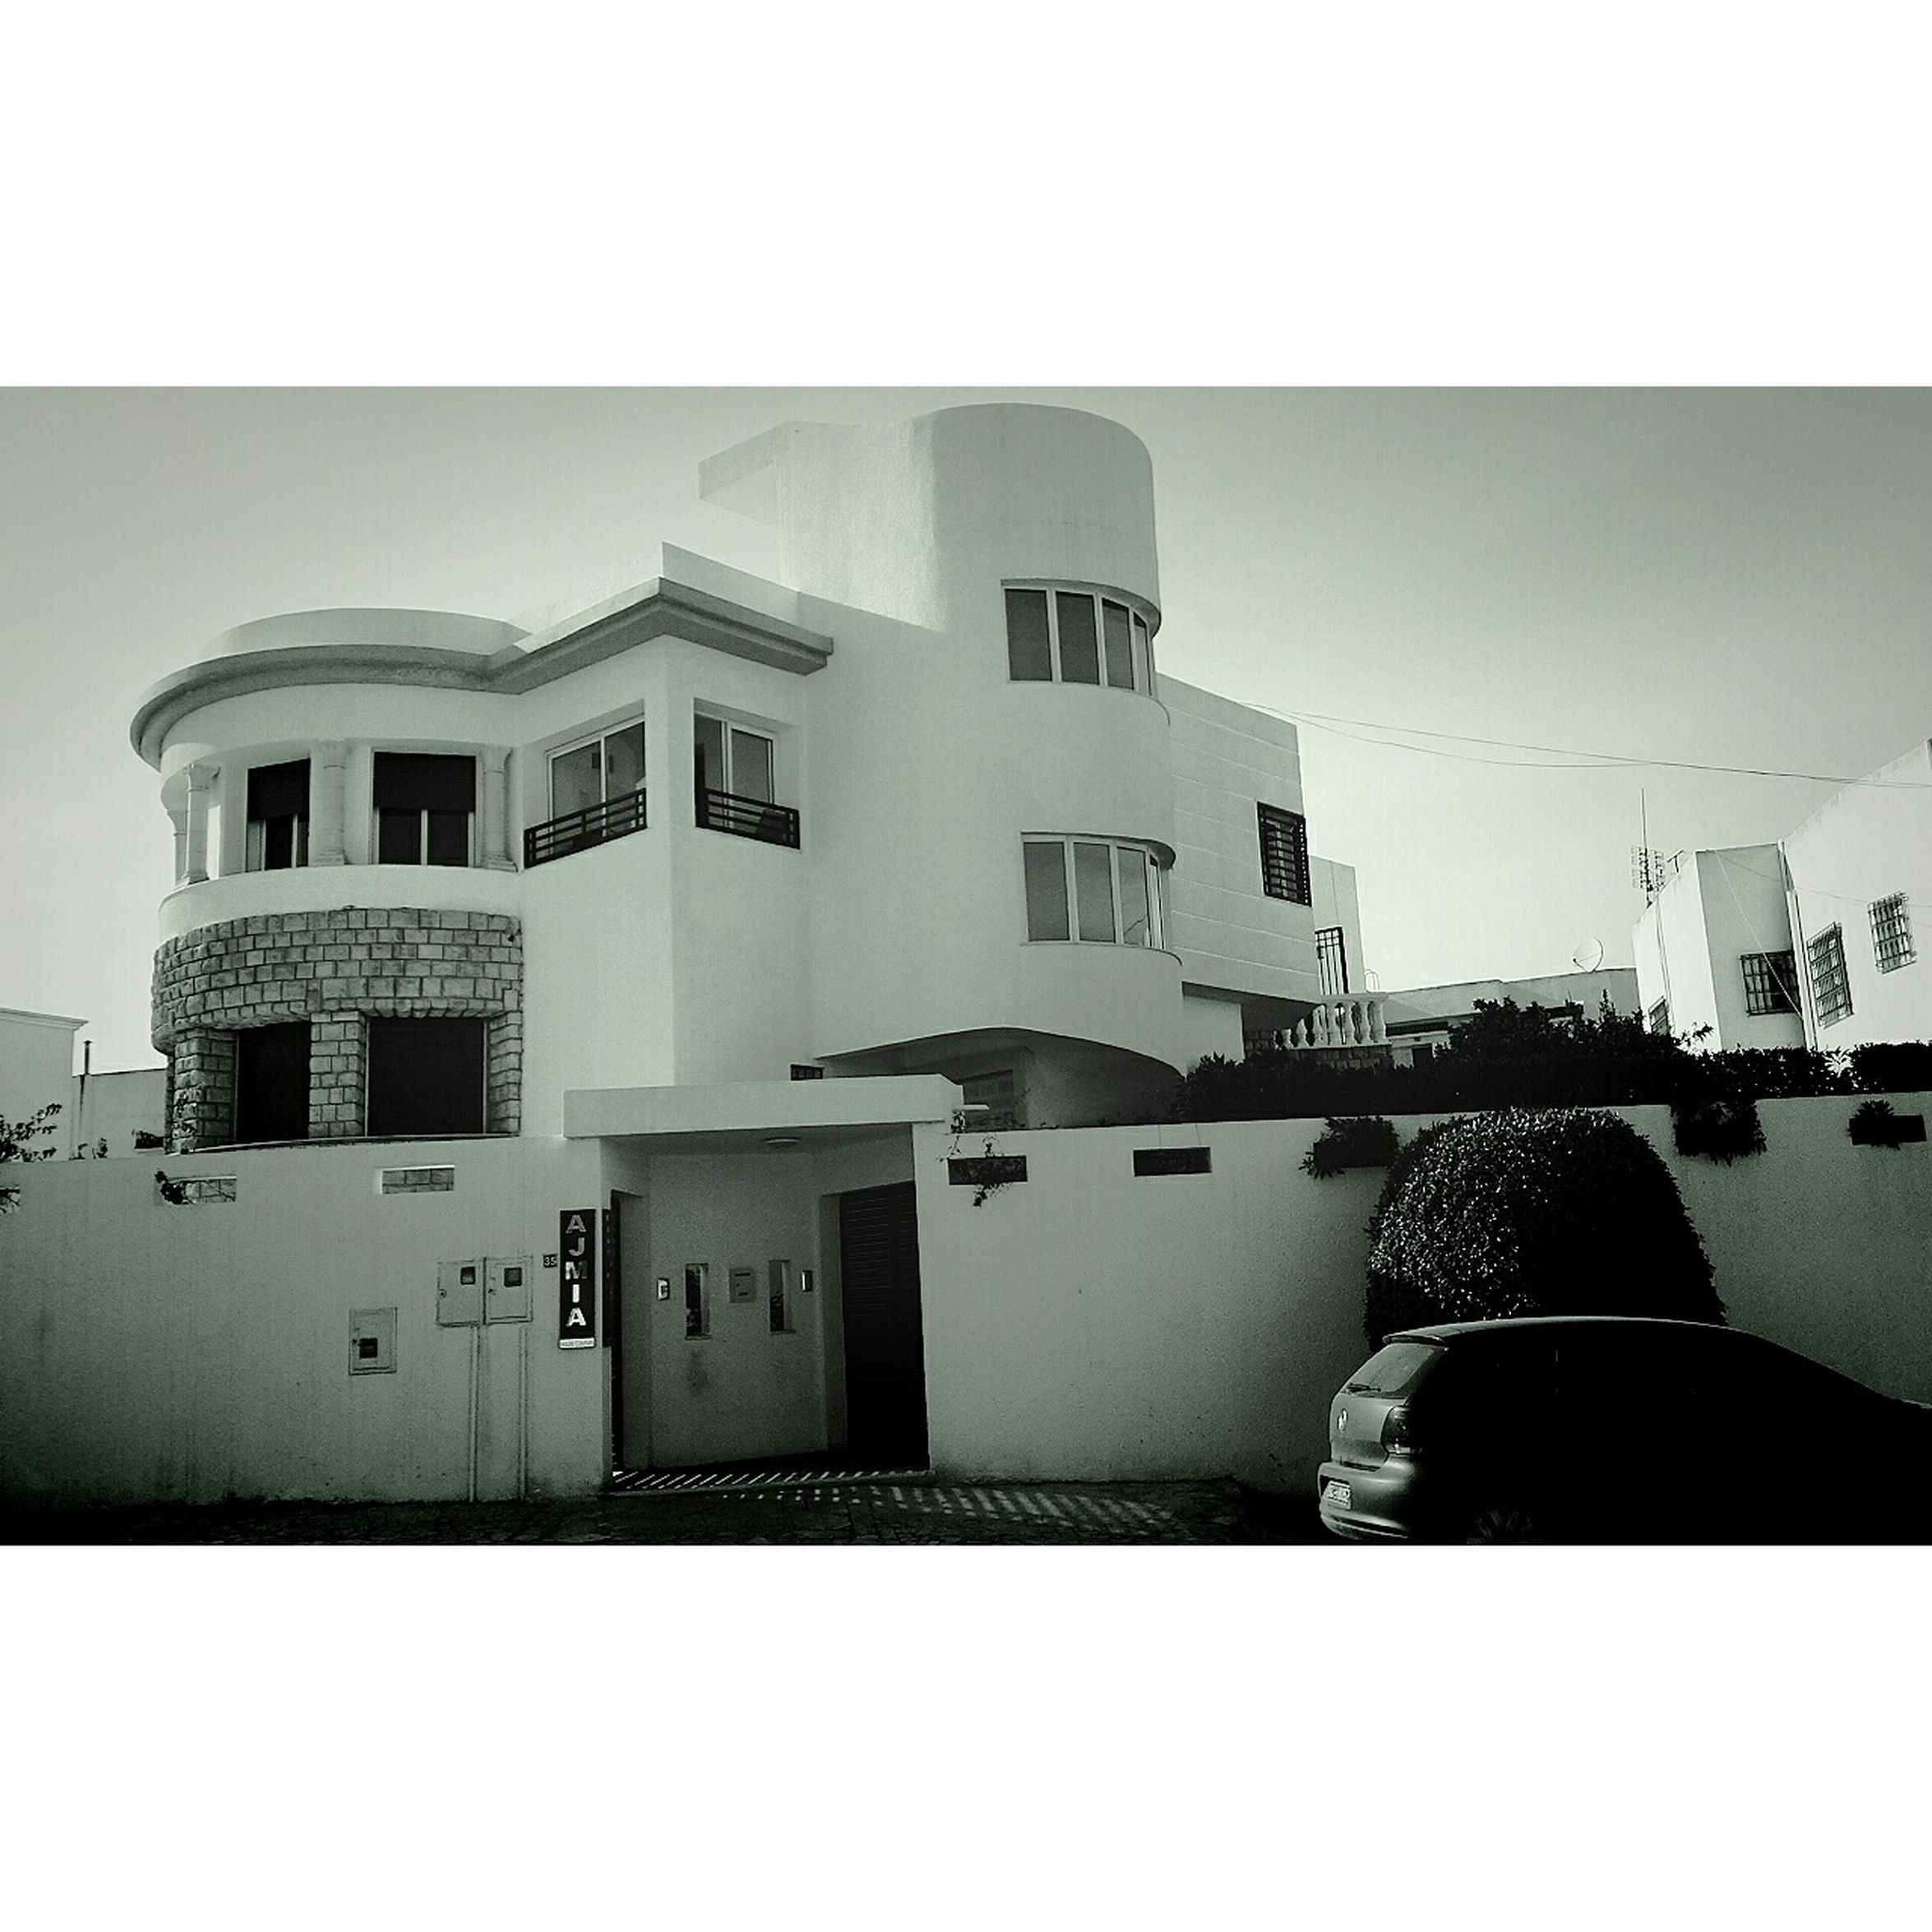 Blackandwhite Taking Photos Architecture_bw Thatishowmodernitylookslike